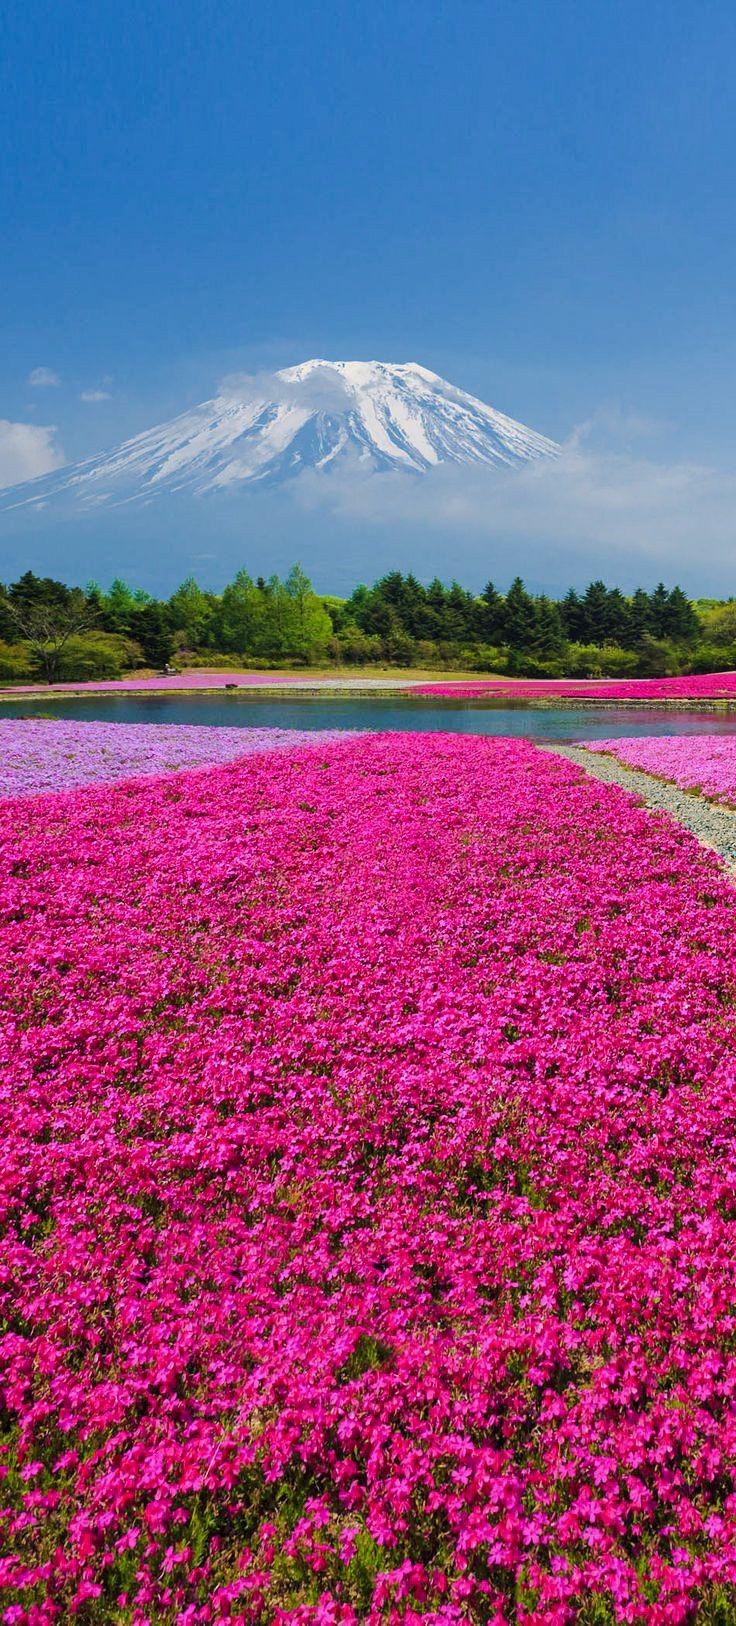 Fuji Shibazakura, Japan; Pink moss